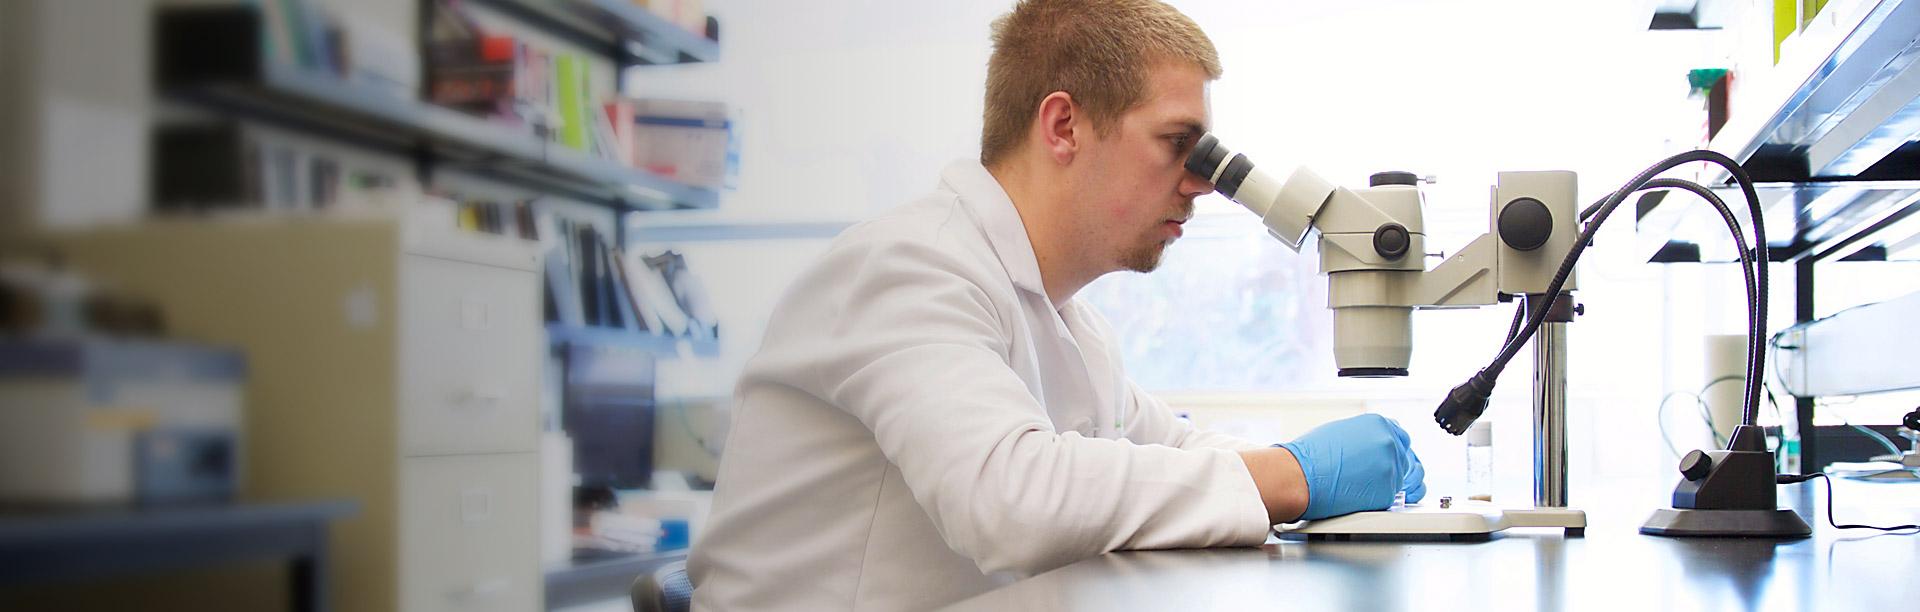 UBCO Okanagan Biology Graduate Student looking through a microscope in Lab